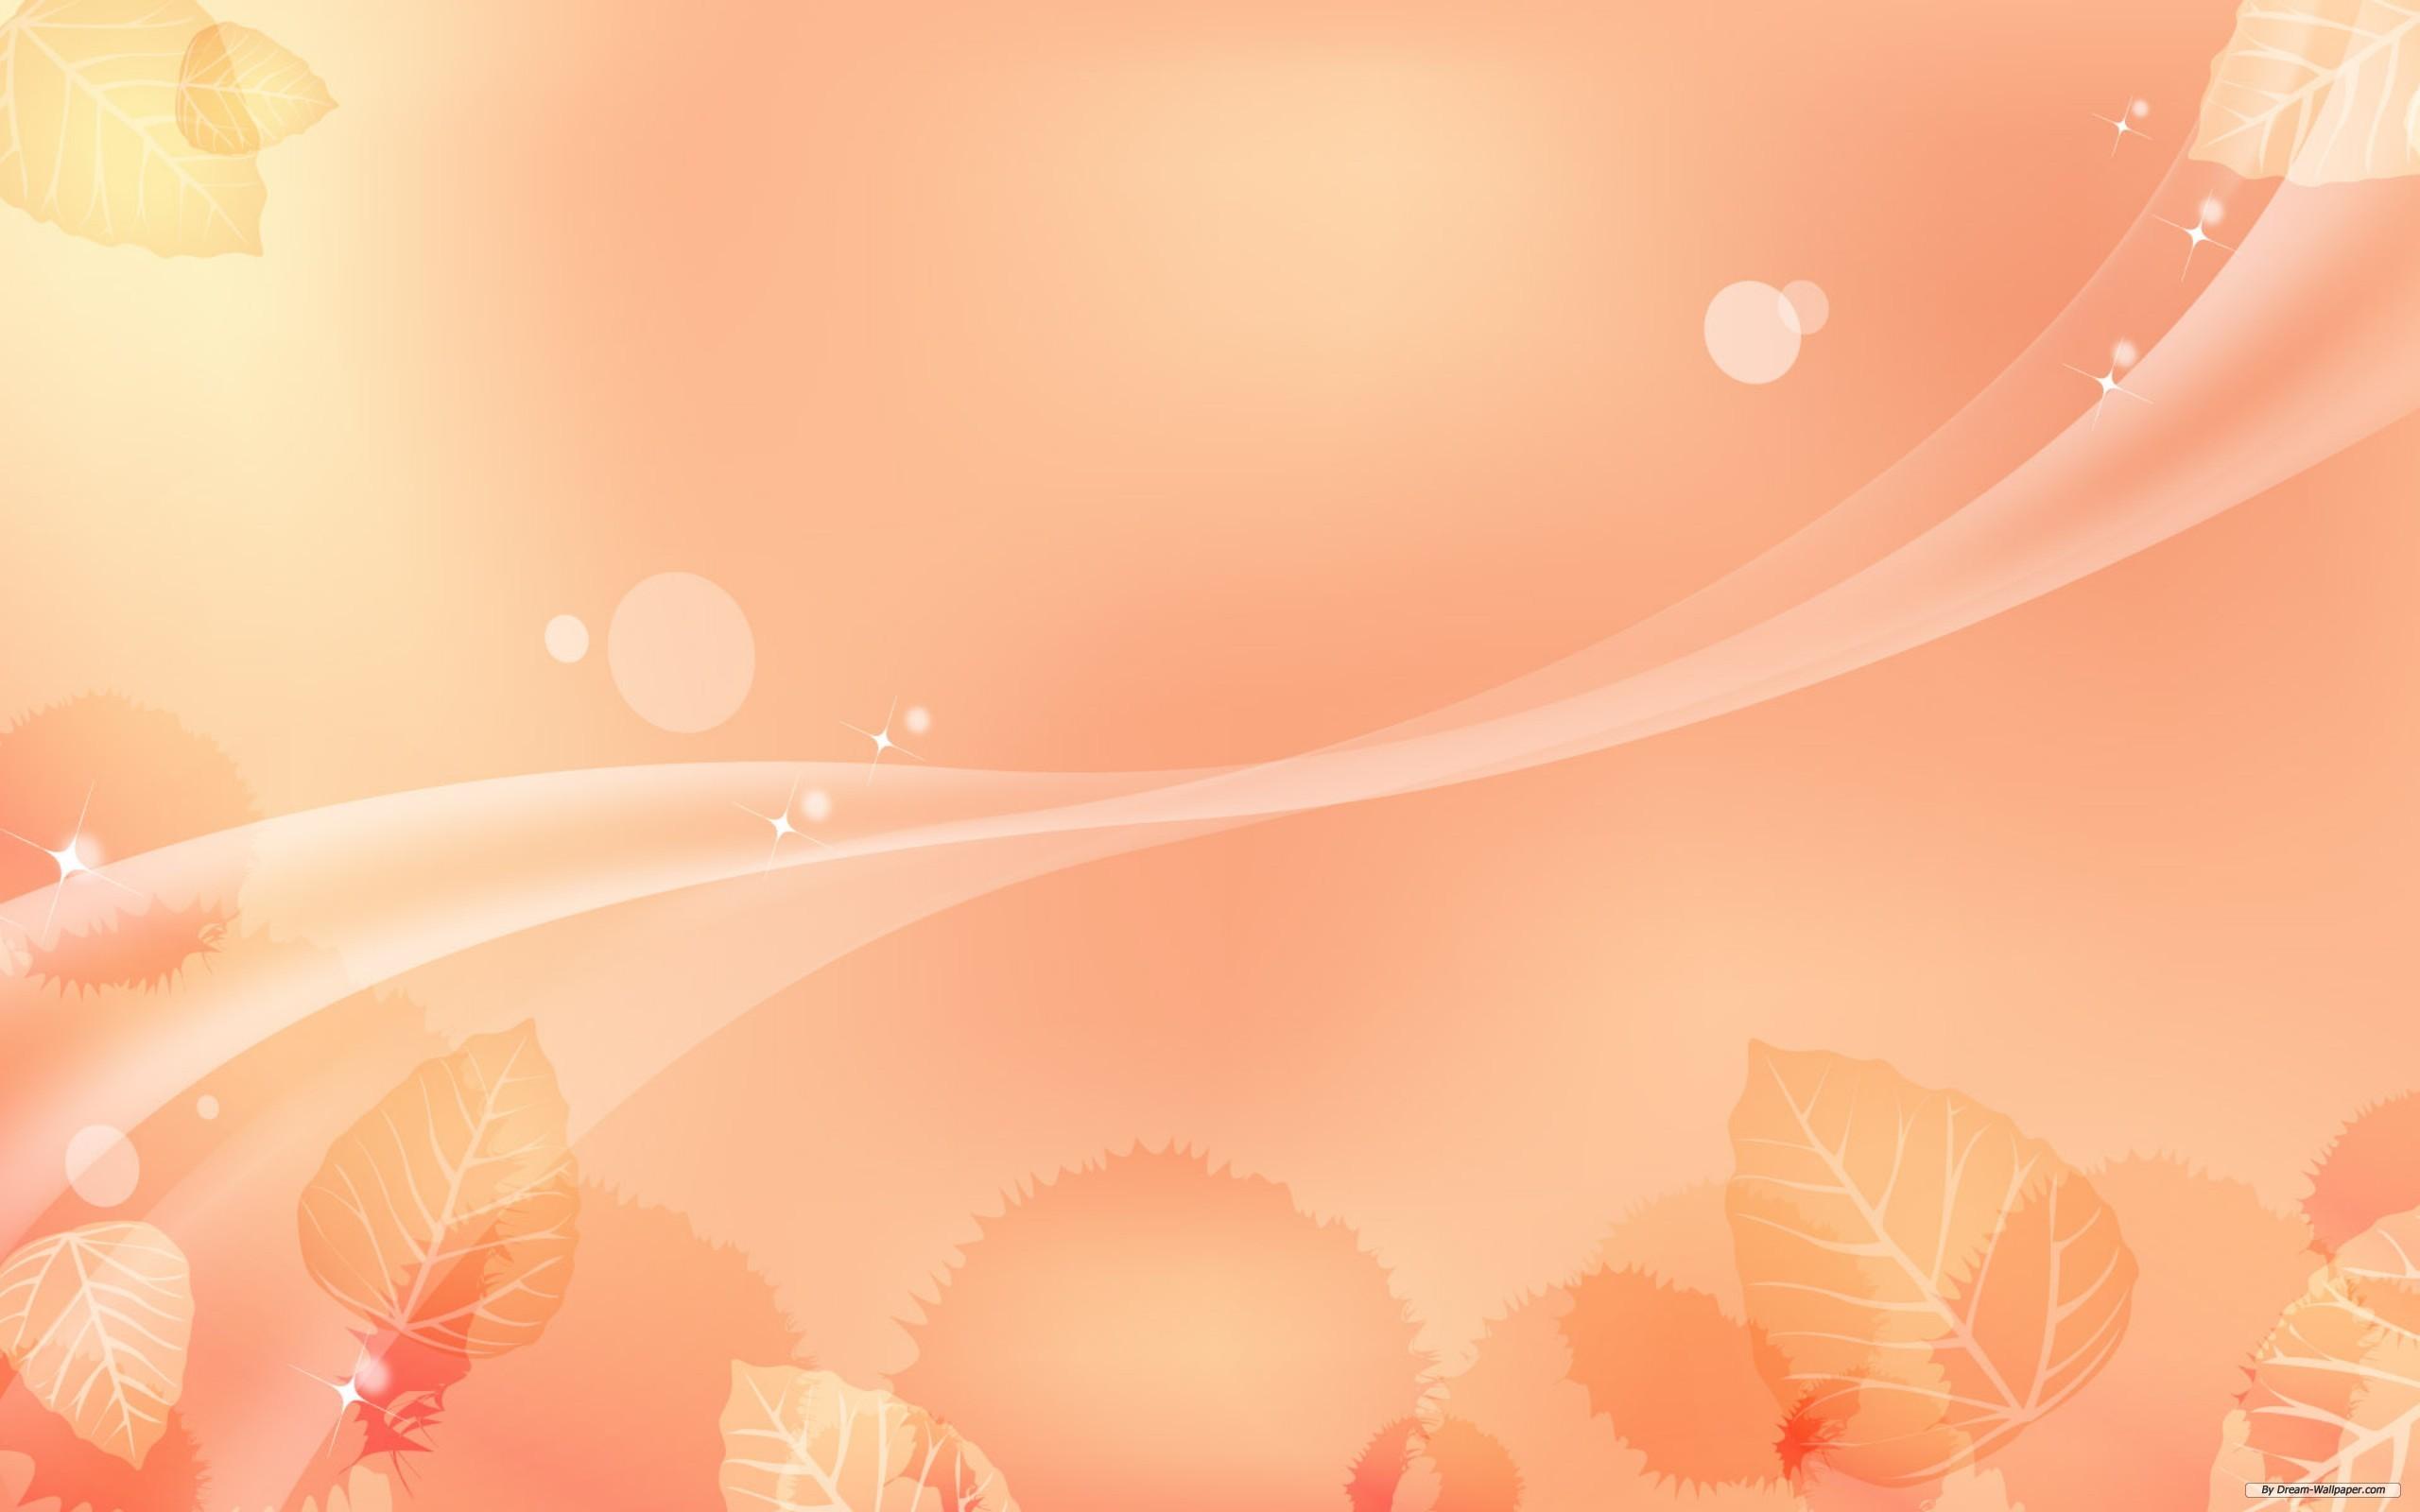 Wallpaper Background 2560x1600